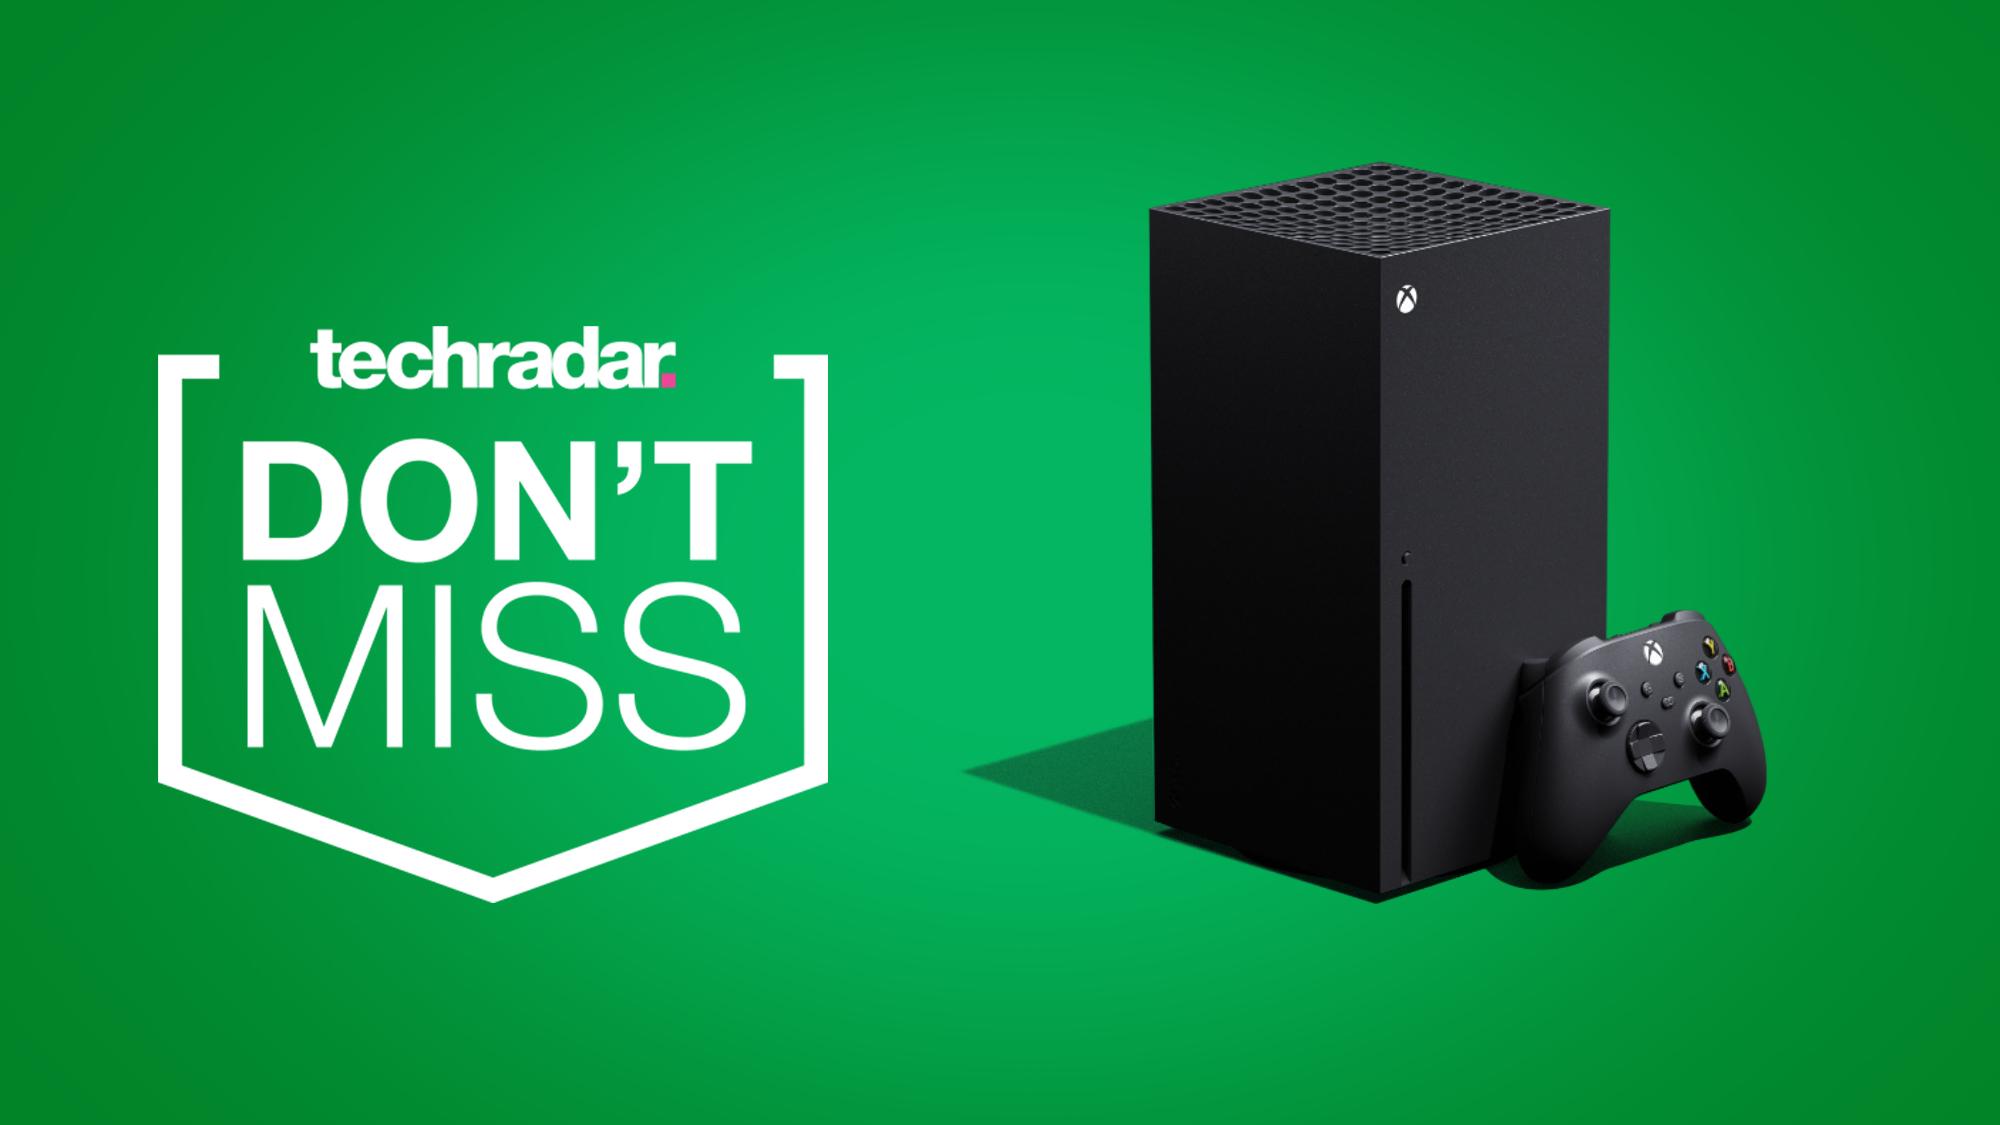 xbox-series-x-restock:-best-buy,-walmart,-target-and-microsoft's-secret-availability